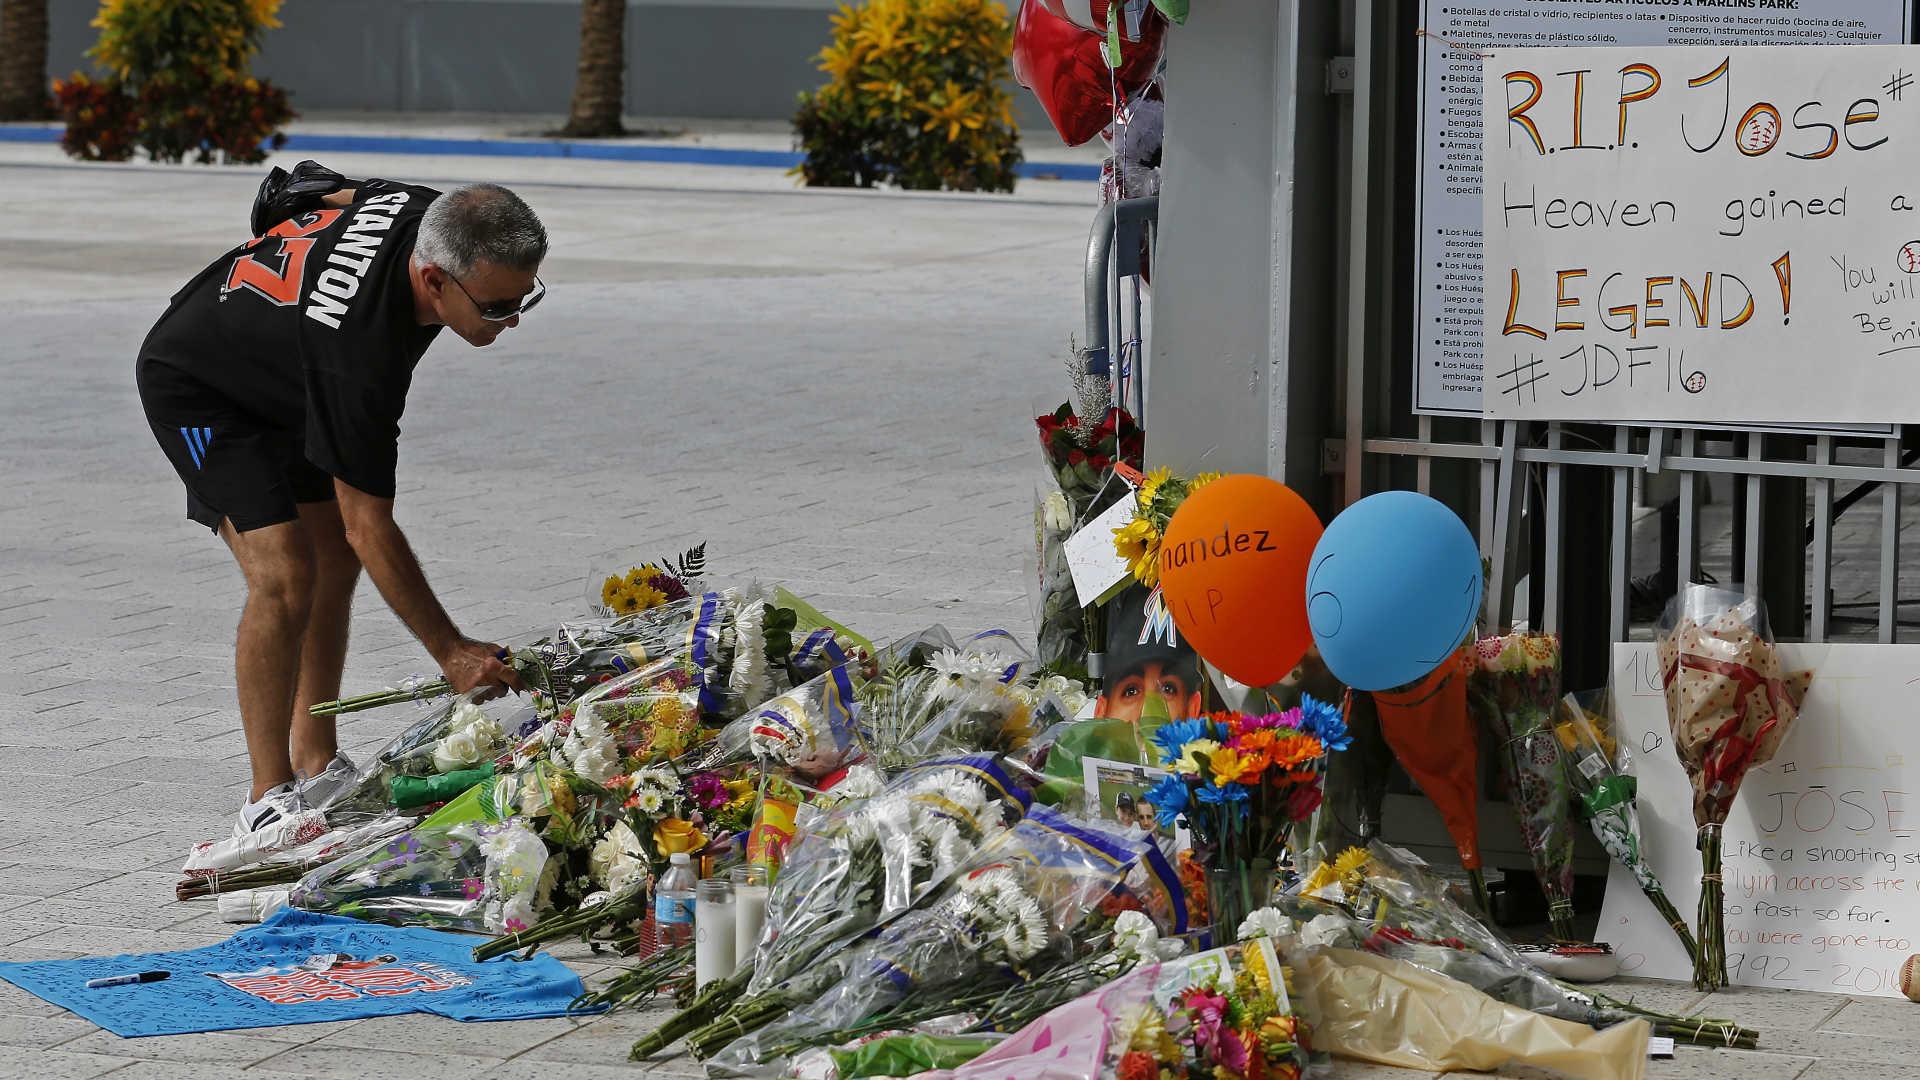 A-makeshift-memorial-to-jose-fernandez_1cxwazum7mnwk12vul2ipyjlgy